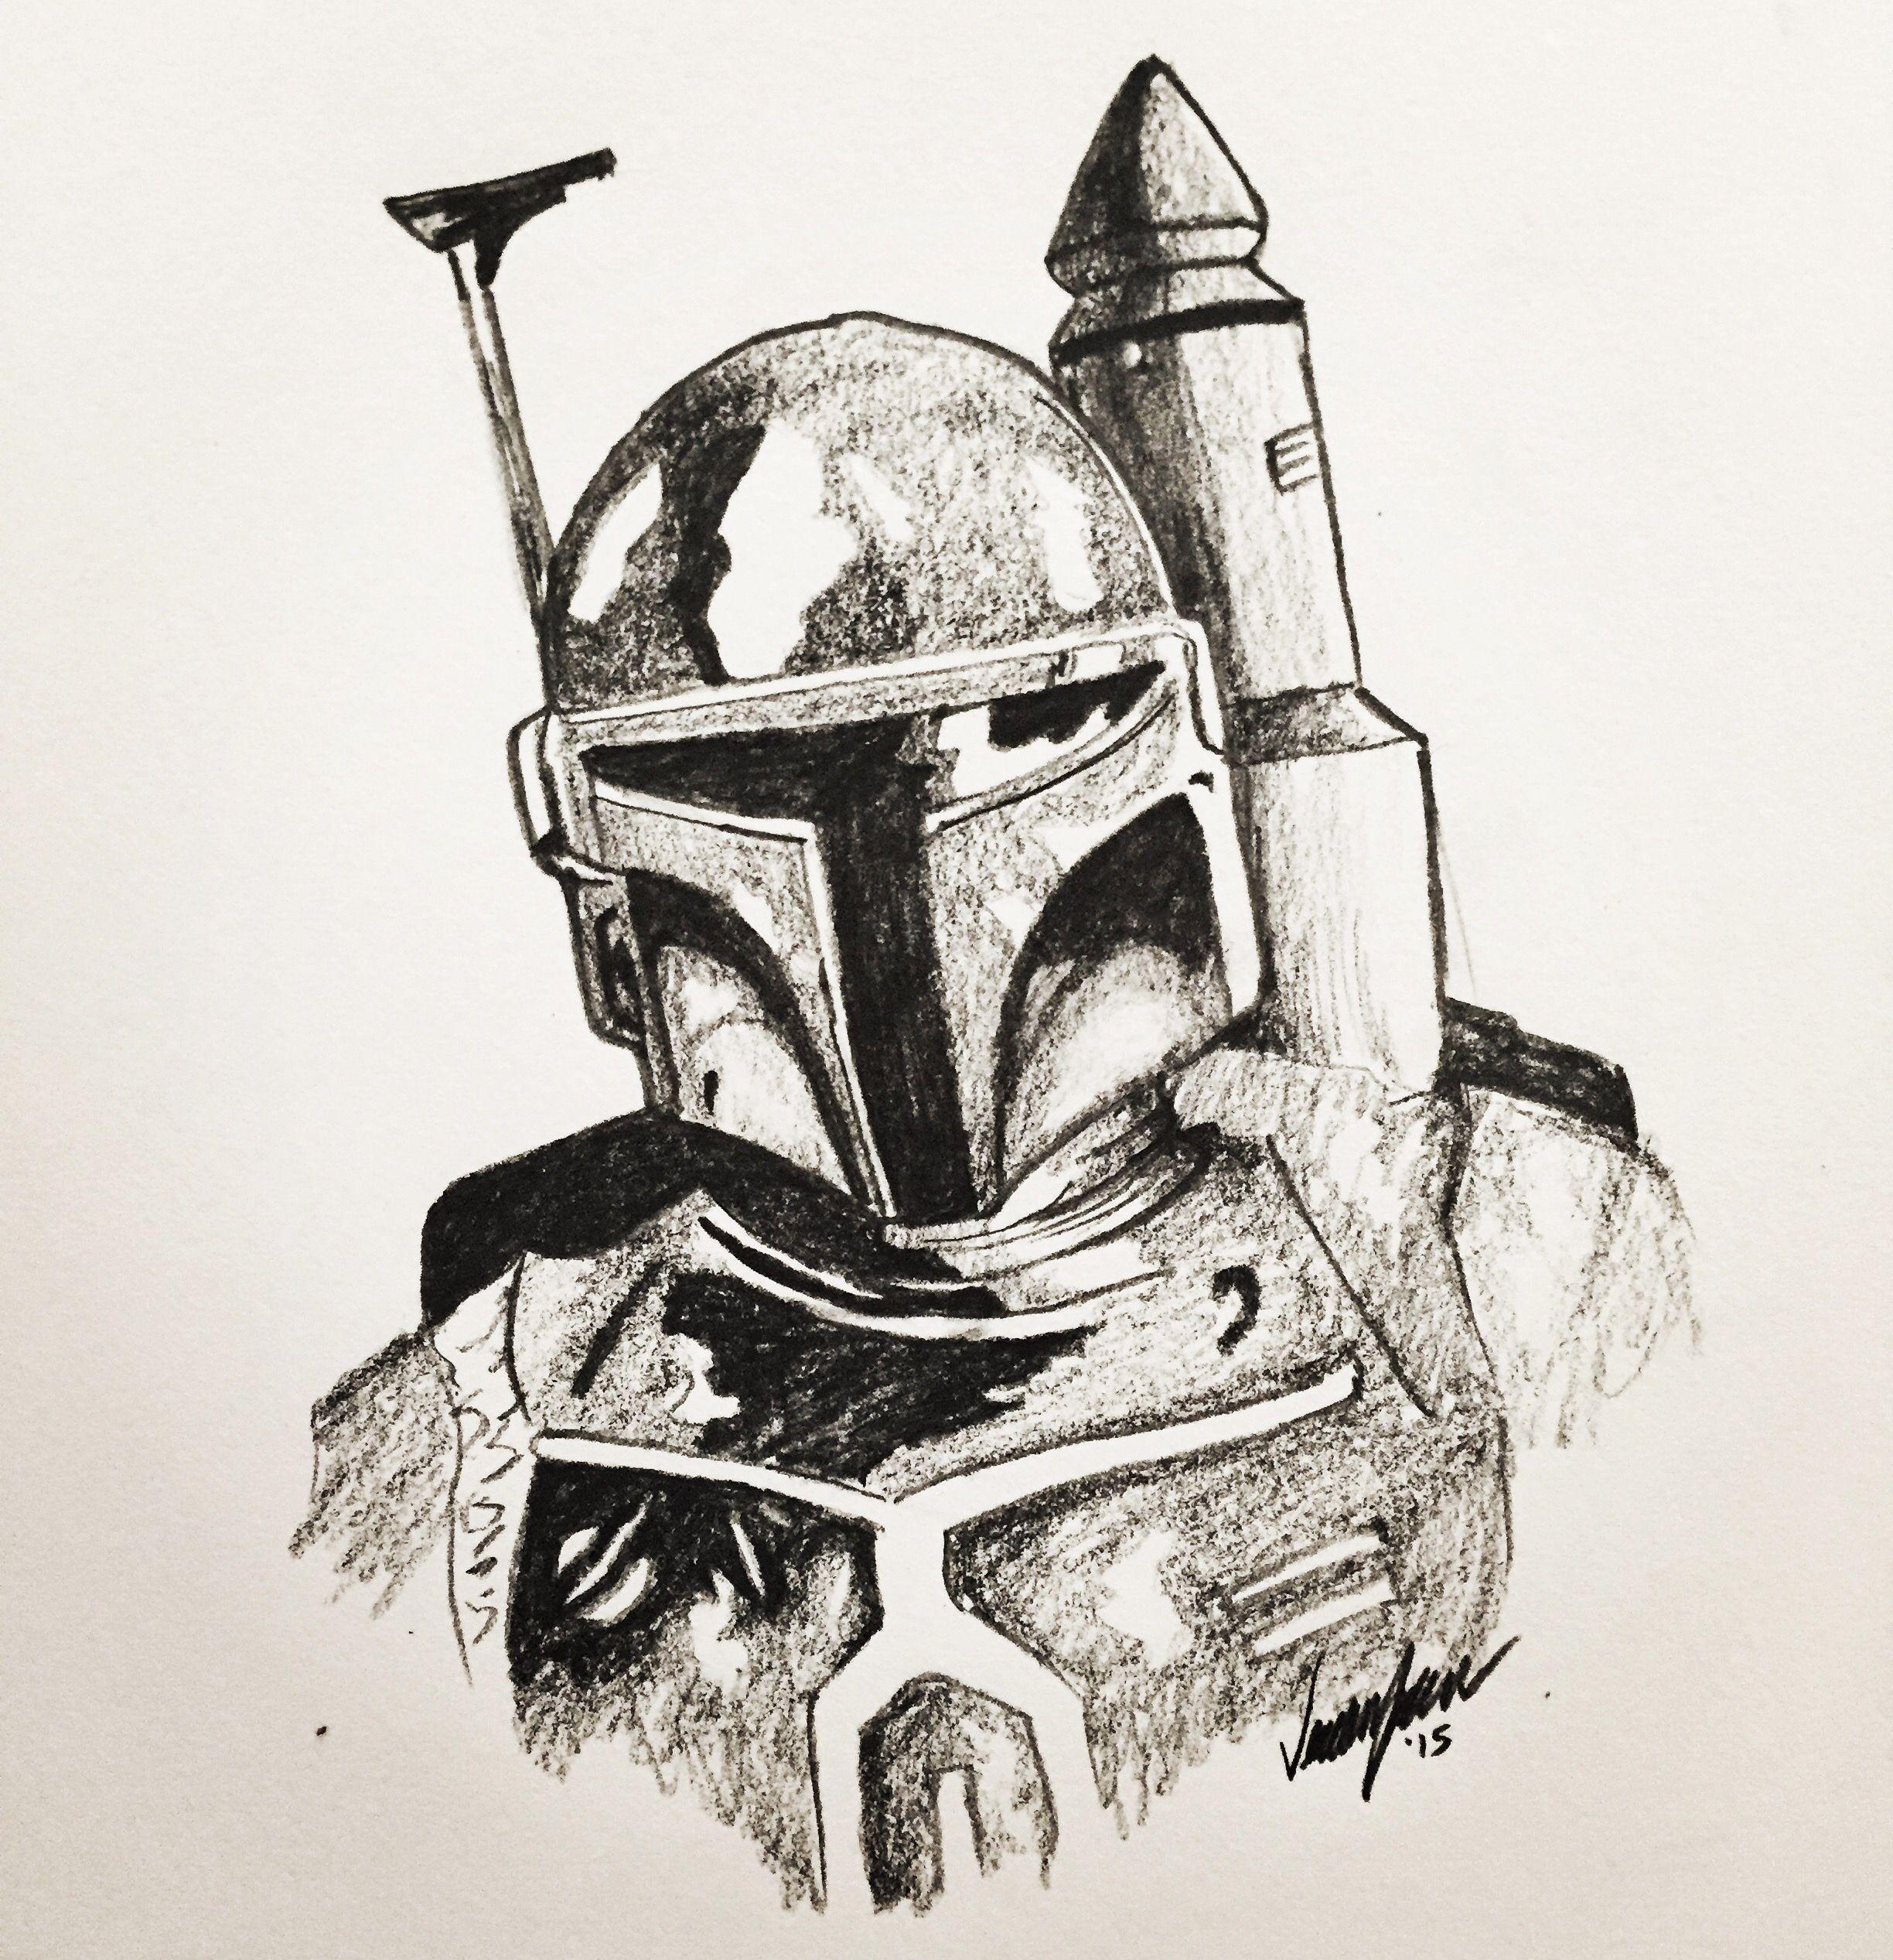 Star Wars Boba Fett Fan Art Pencil Drawing Star Wars Art Drawings Star Wars Drawings Star Wars Fan Art Drawing